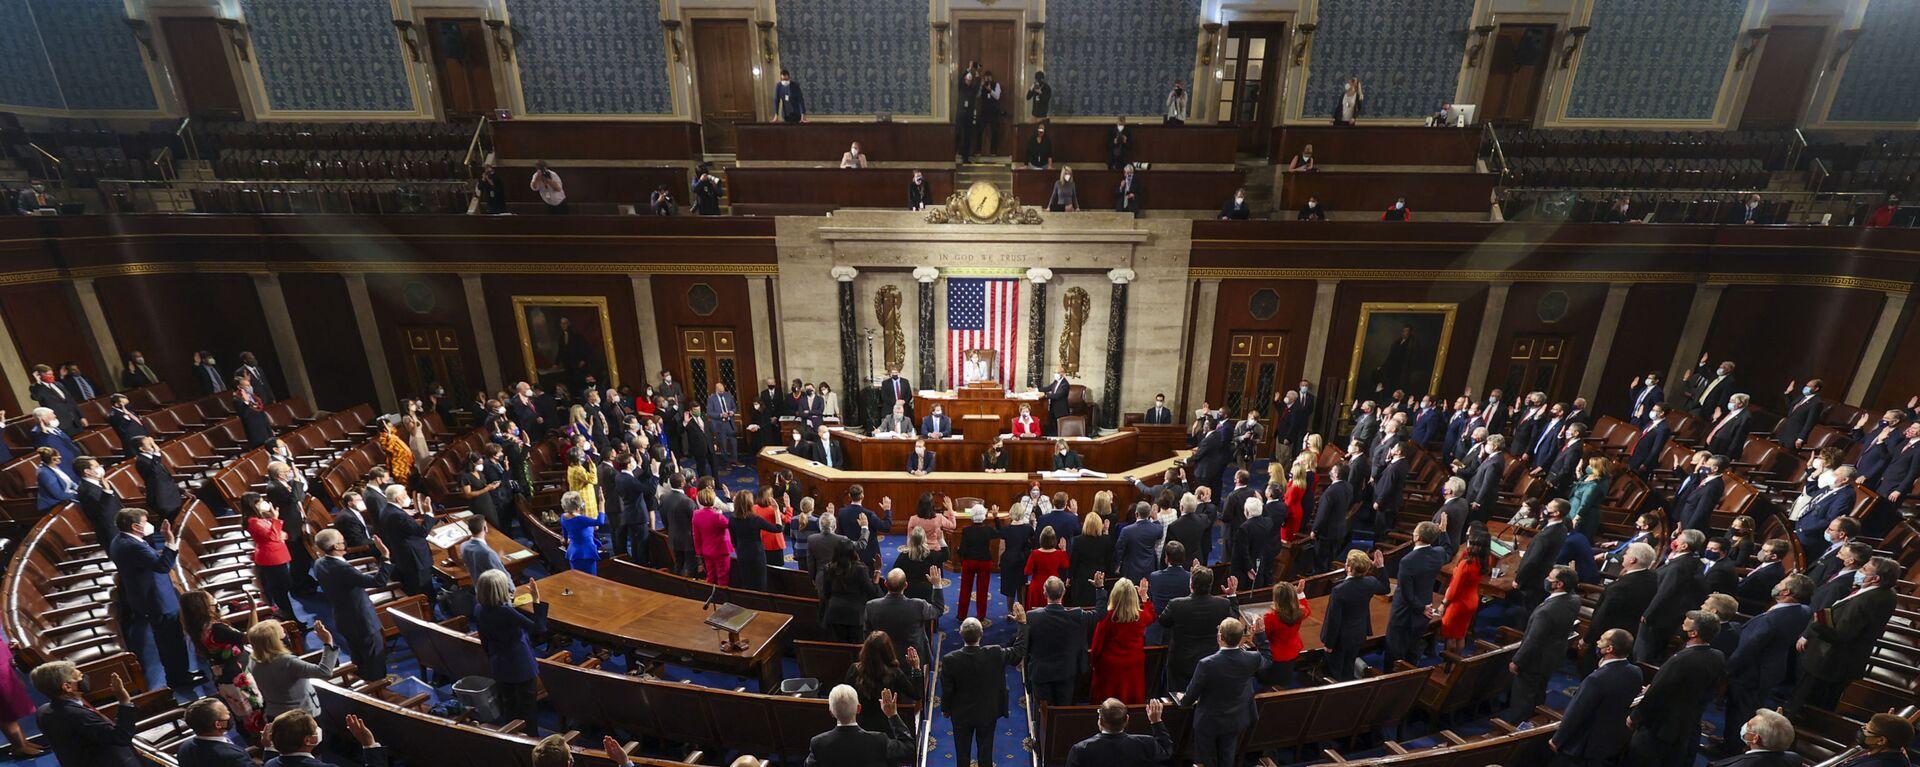 Sněmovna reprezentantů Kongresu USA - Sputnik Česká republika, 1920, 21.08.2021